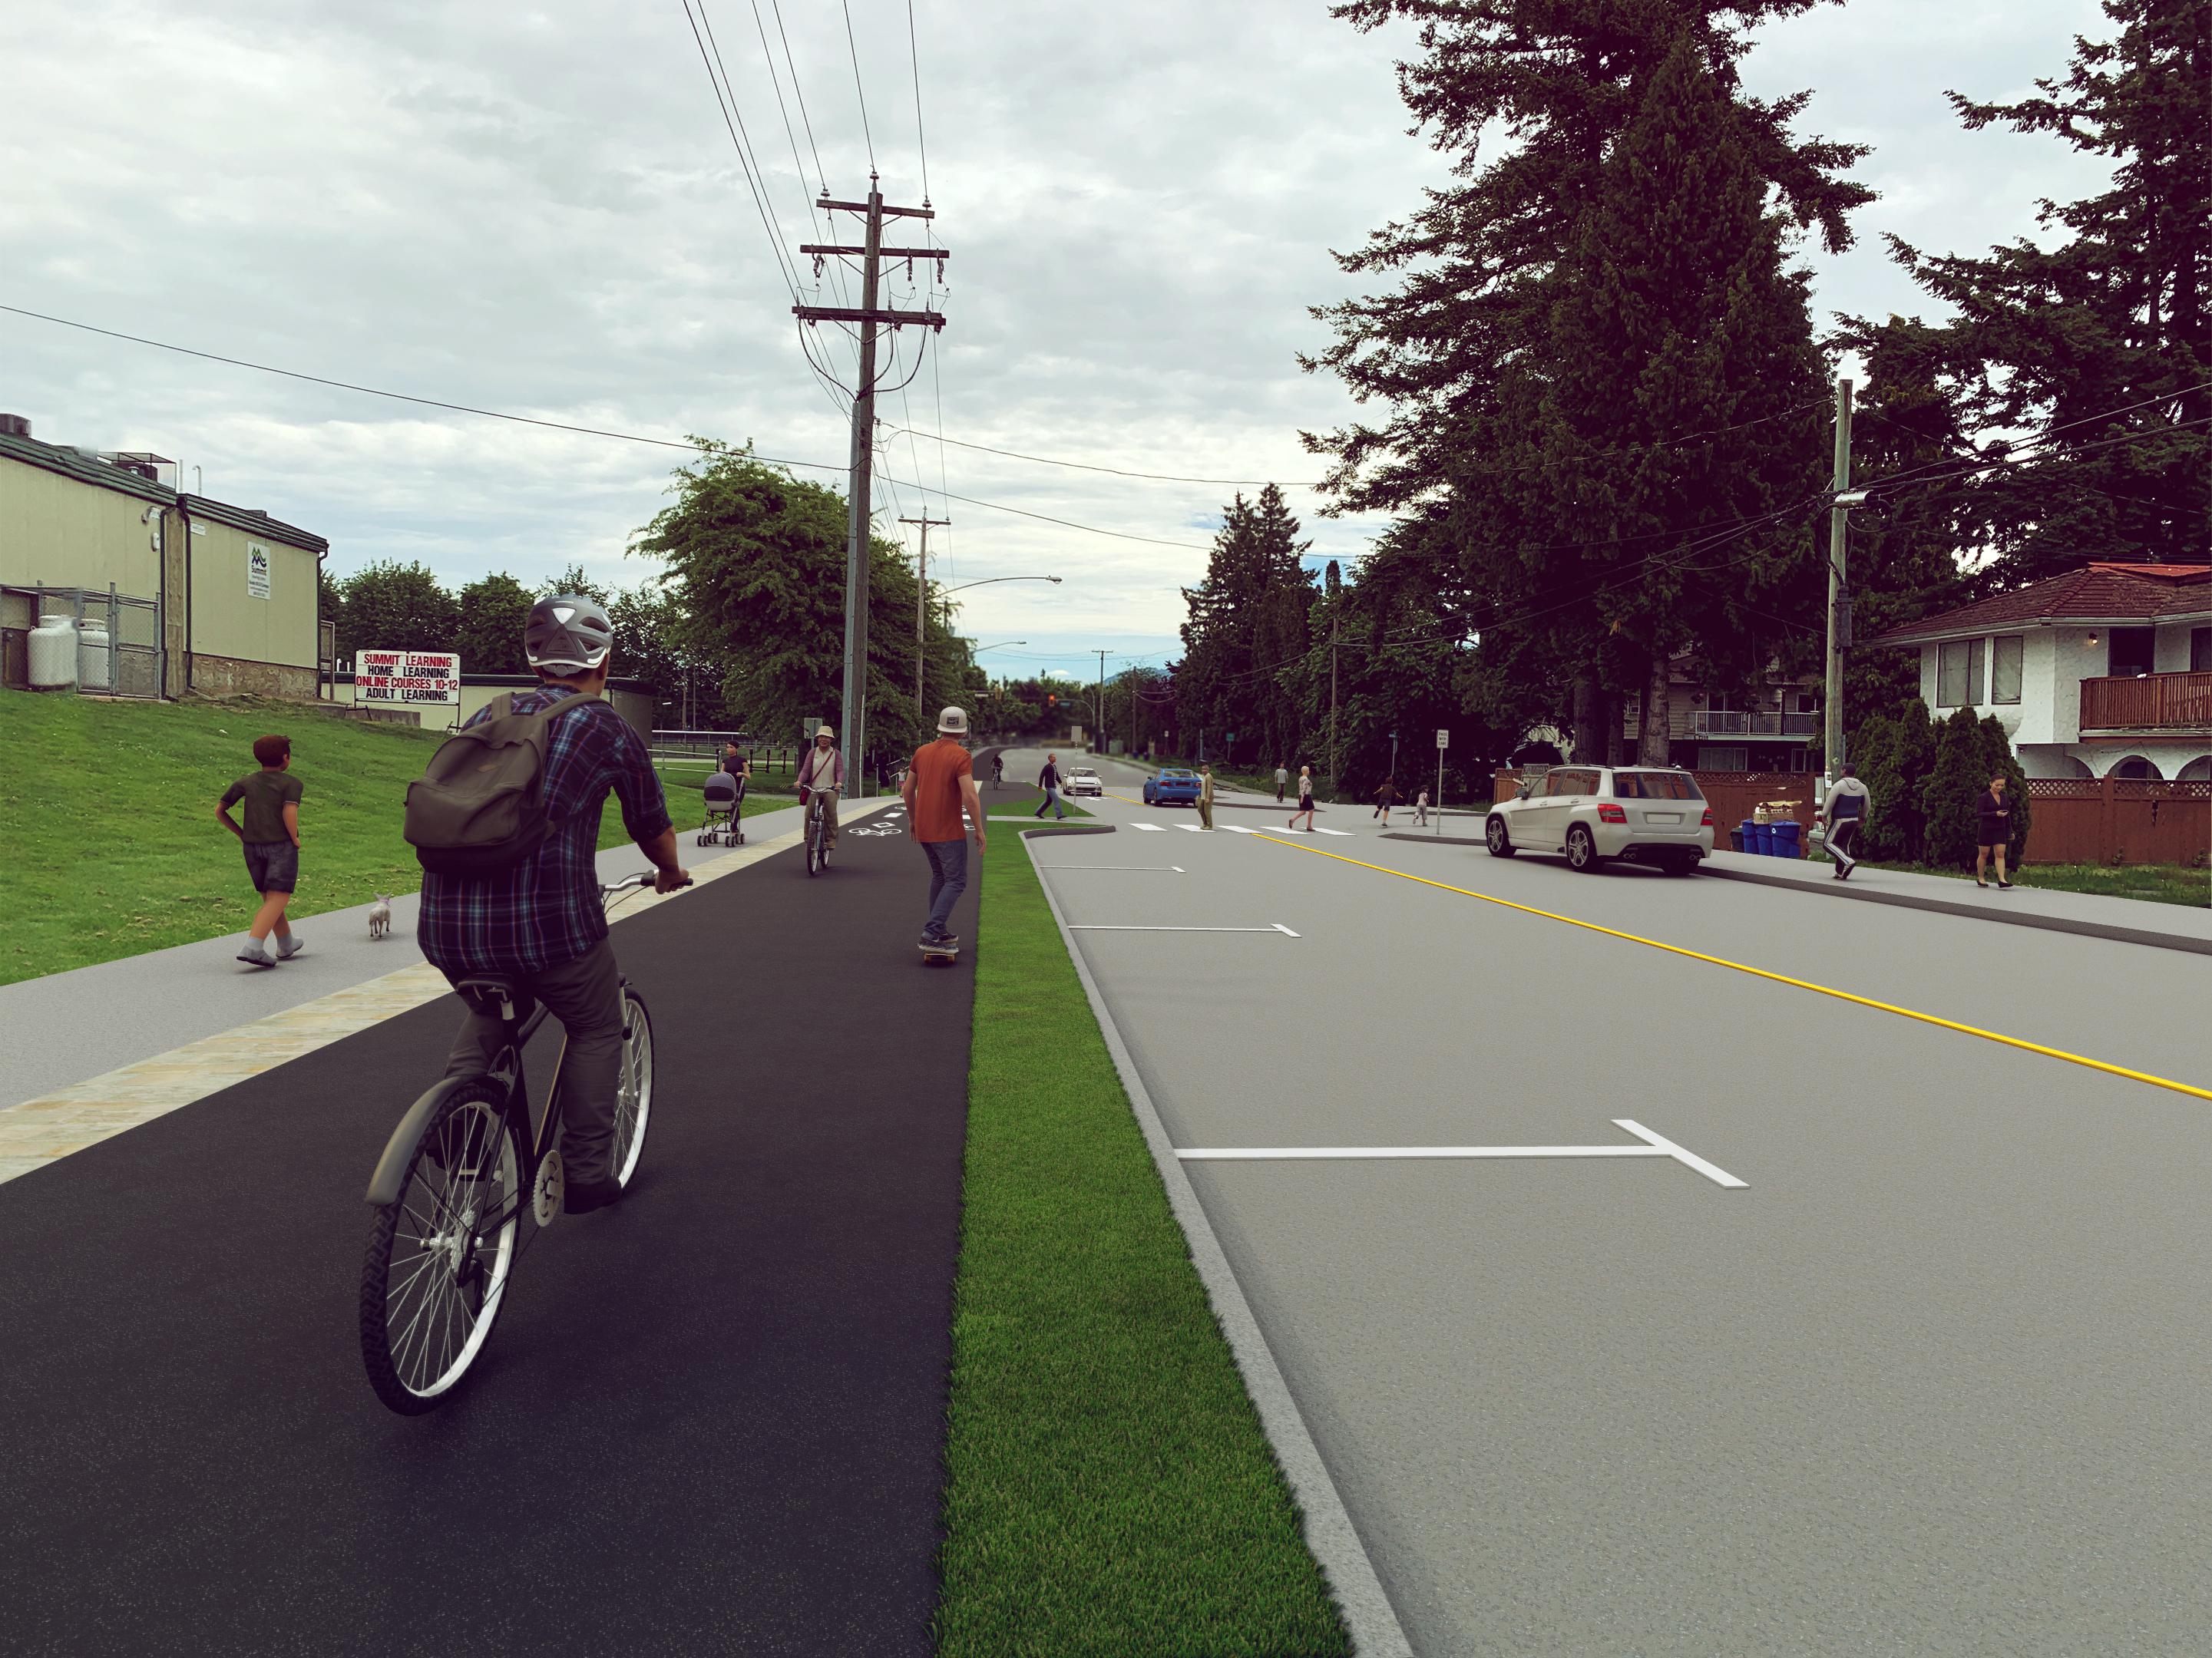 Image of Option 2: Two-Way Protected Bicycle Lane